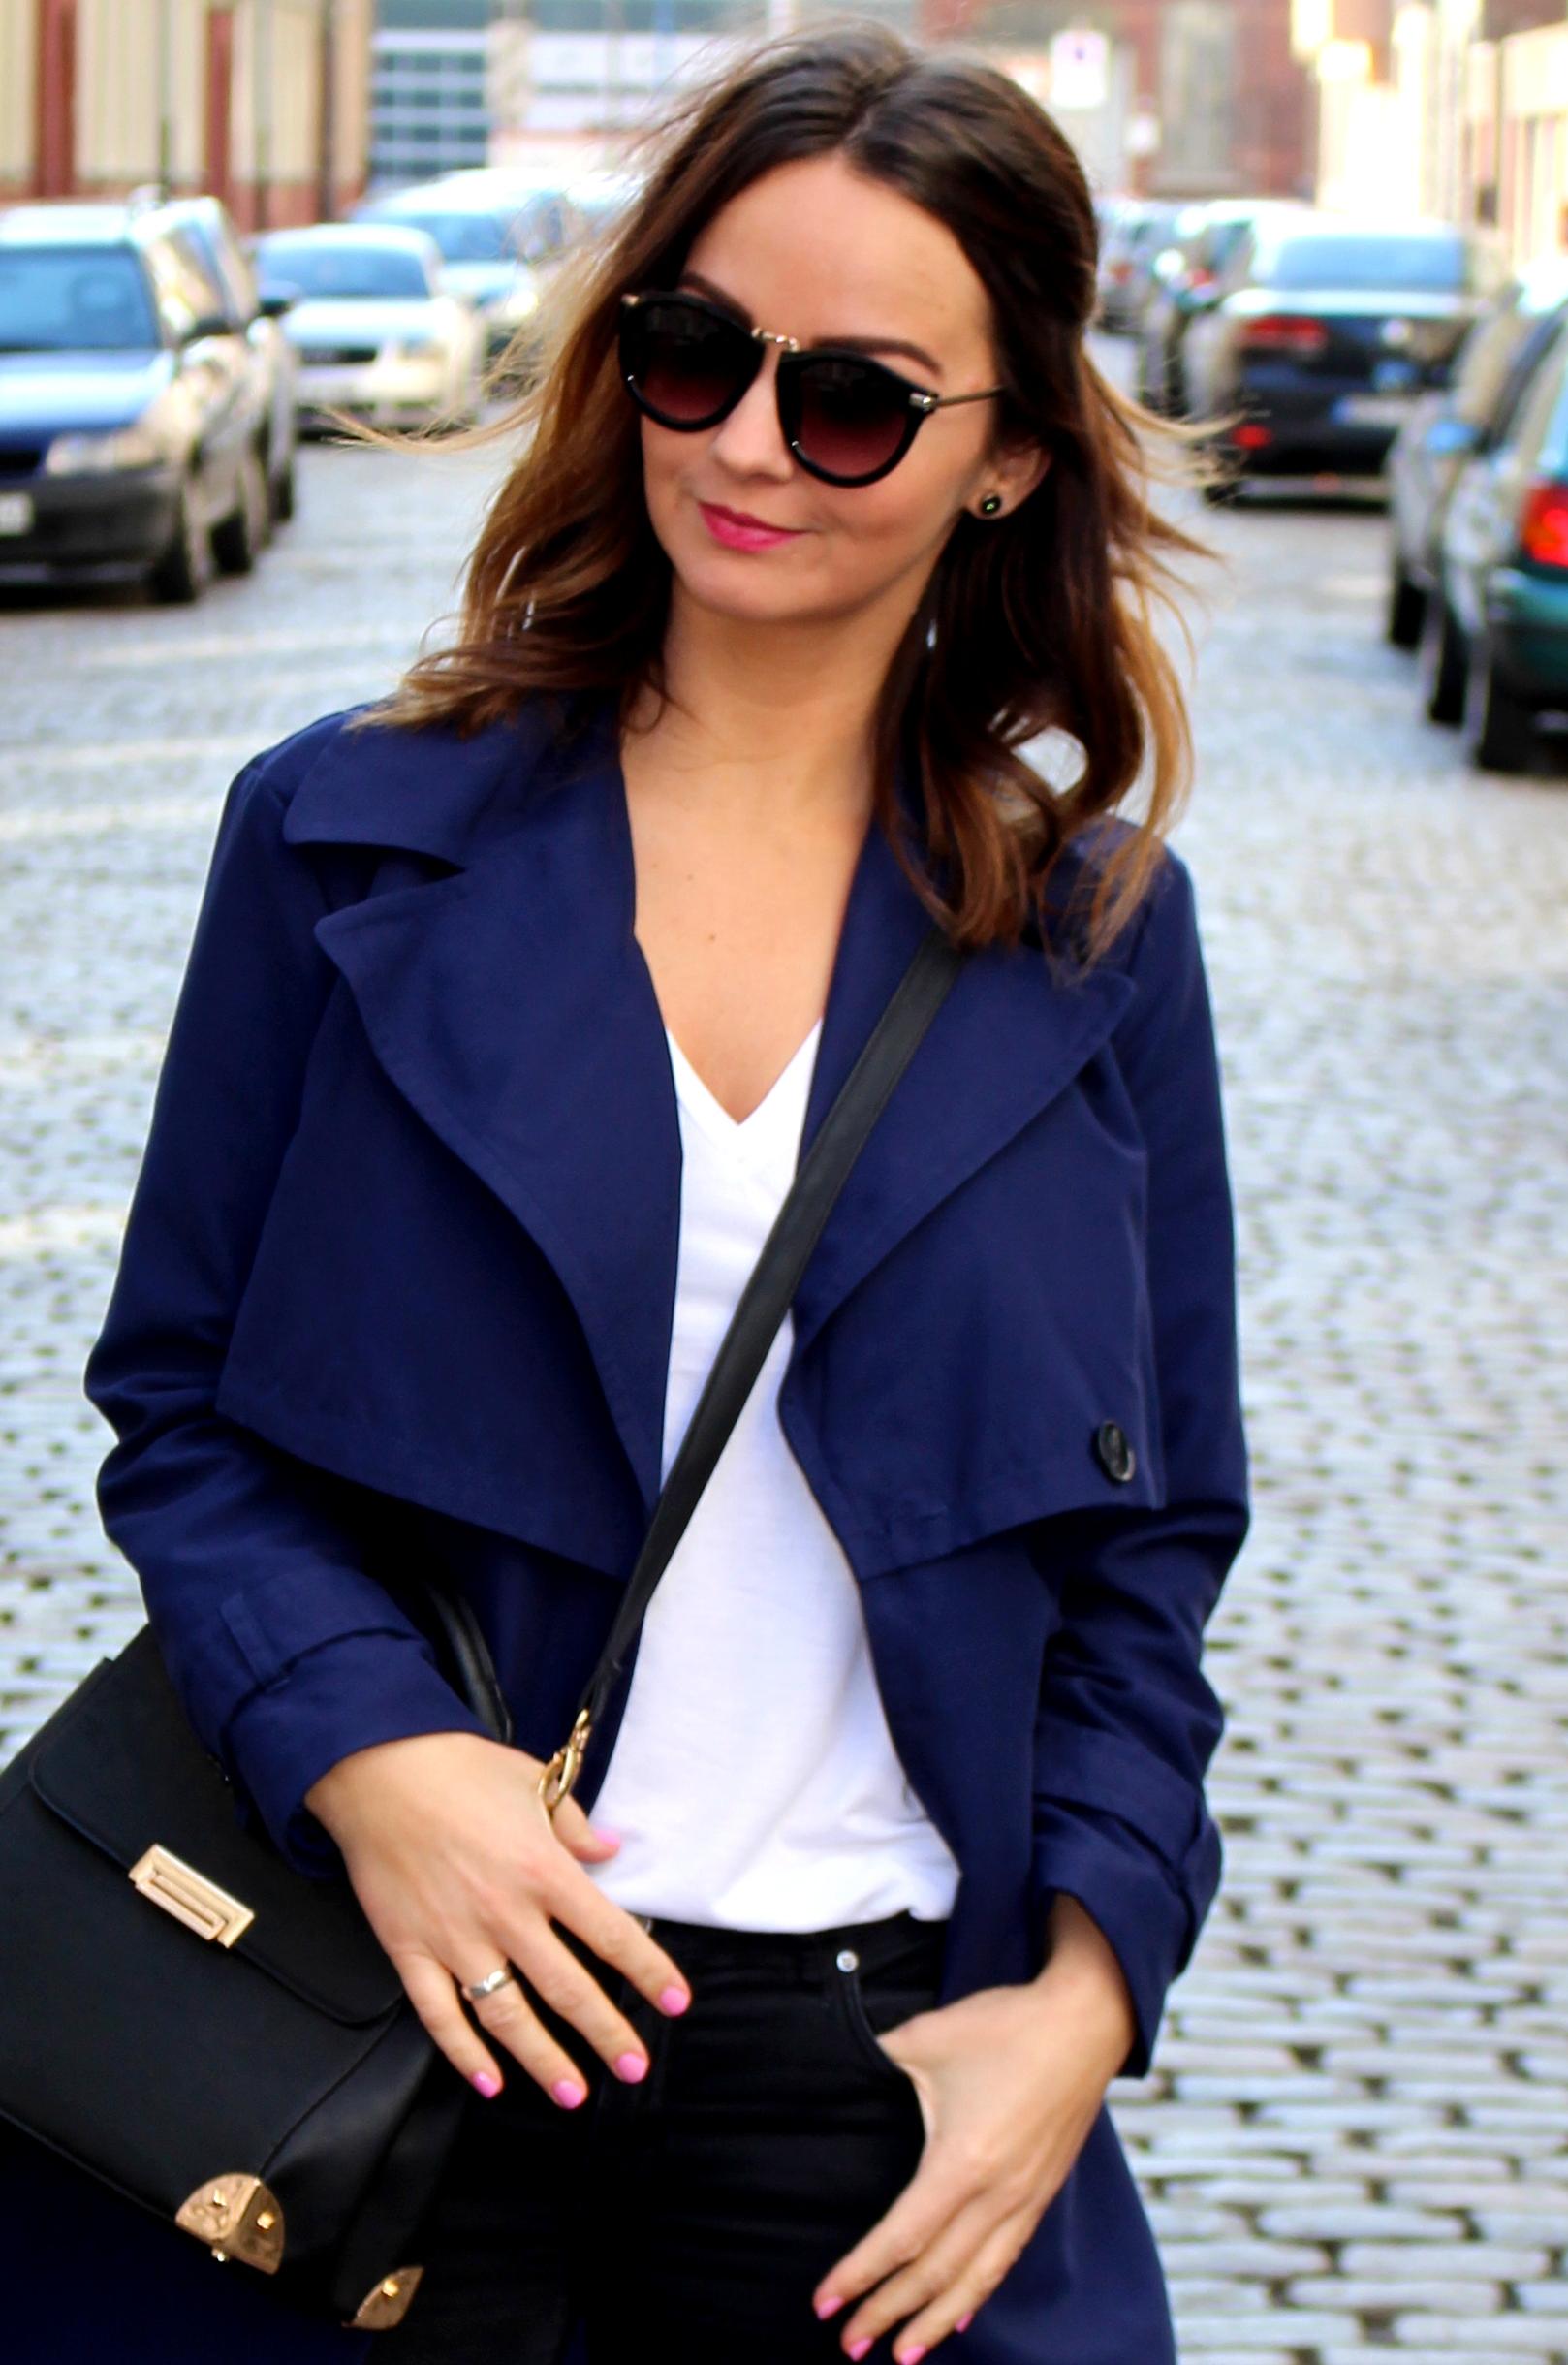 Fashioncircuz by Jenny img_2886 SHADES OF BLUE